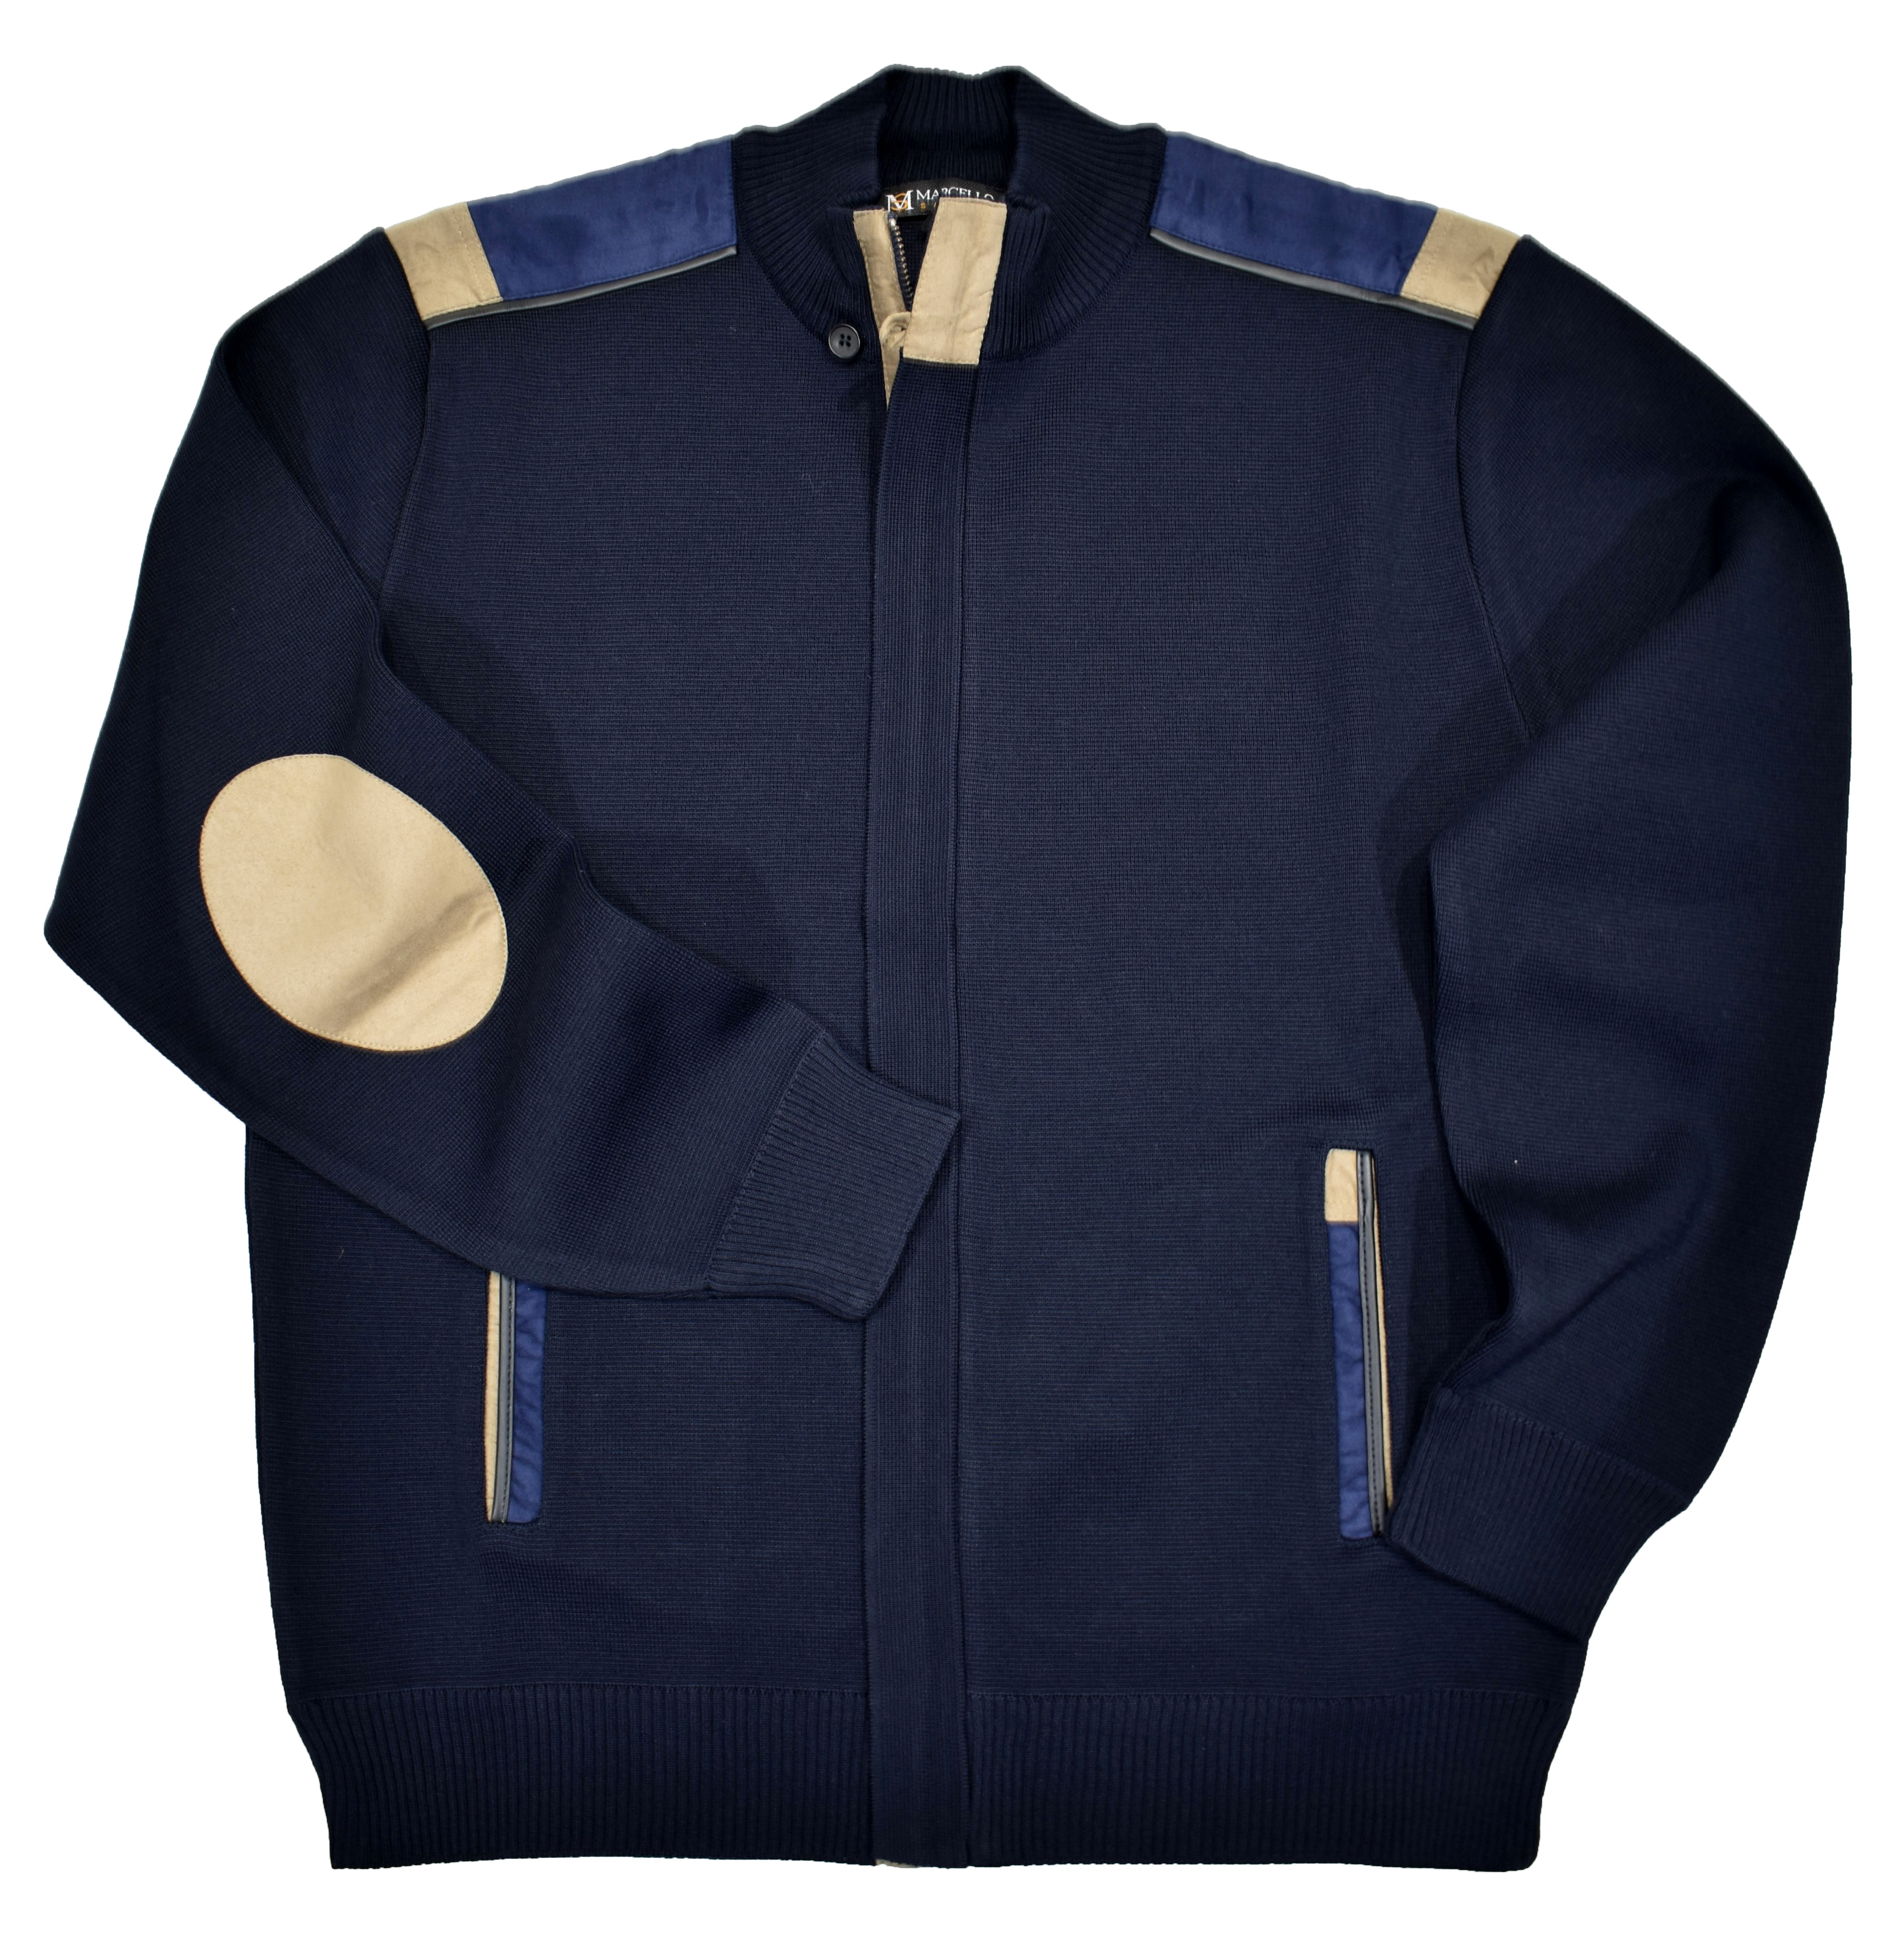 Marcello Mock Neck Zipper Sweater Navy 525